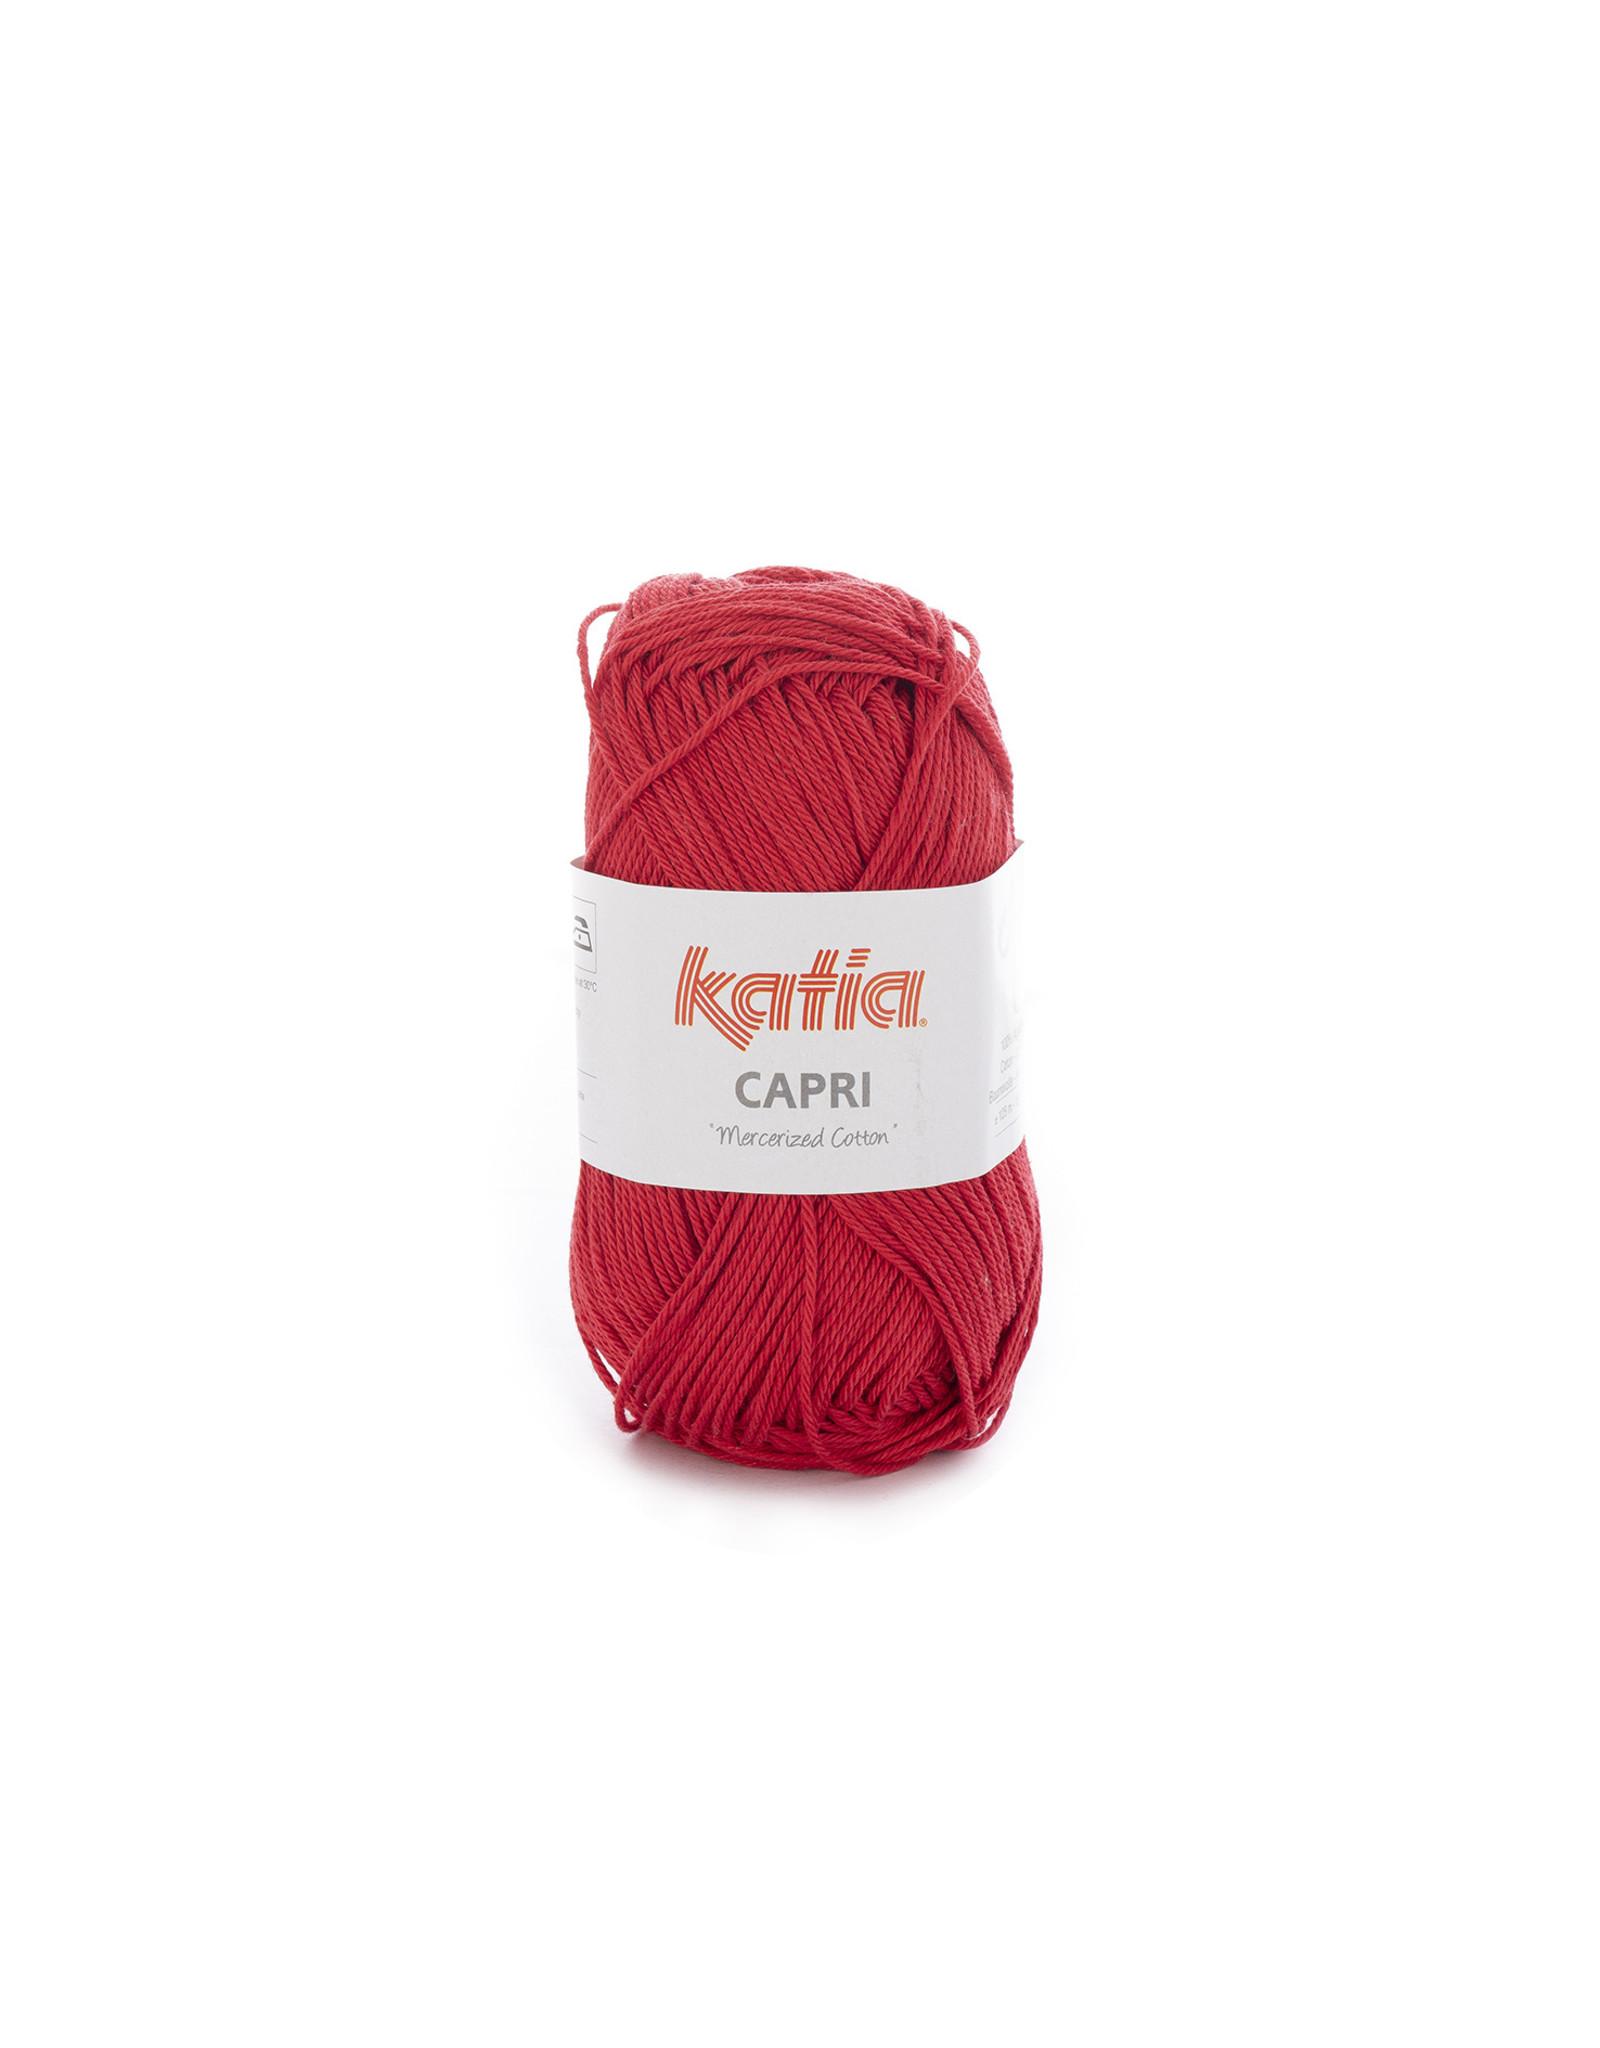 Katia Katia Capri - kleur 59 Rood - bundel 5 x 50 gr. / 125 m. - 100% katoen